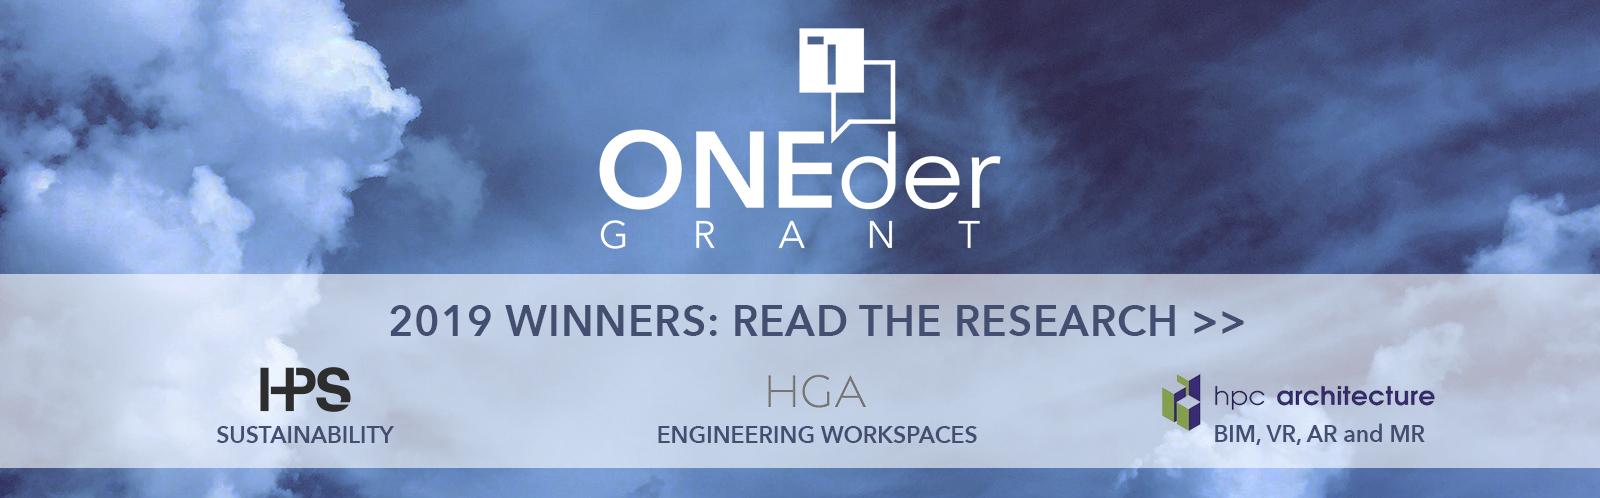 2020_06-11-ONEder Grant Main - Banner